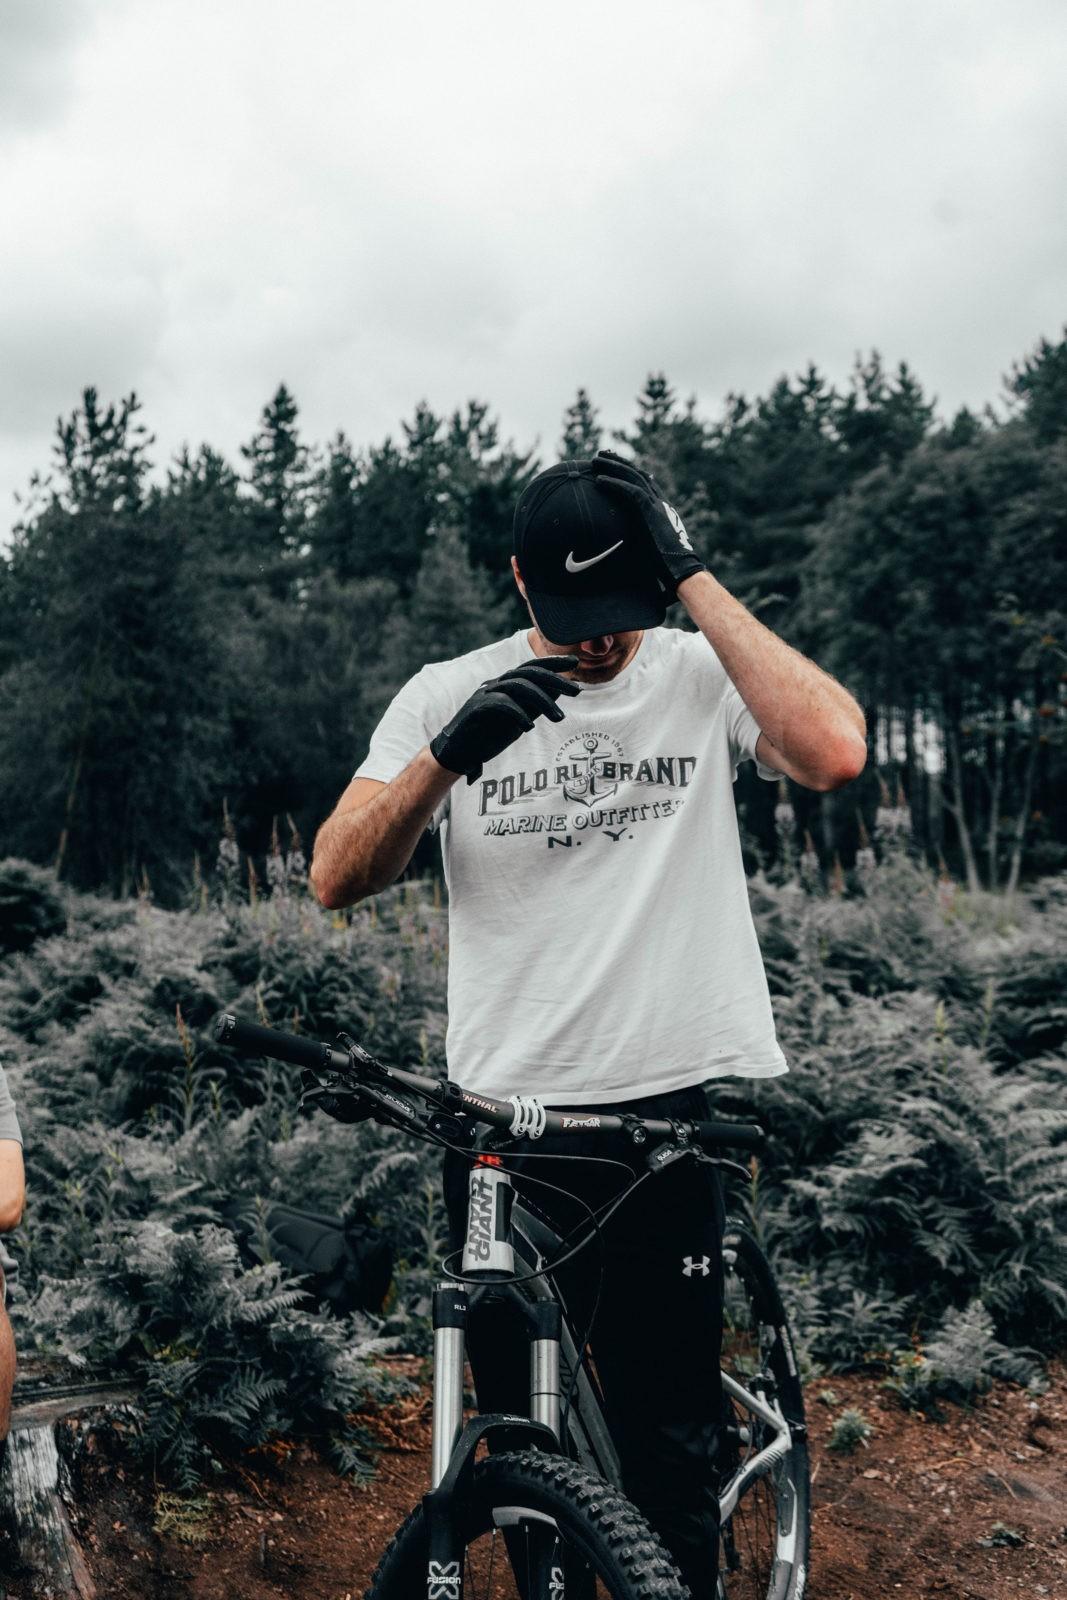 Навык езды на велосипеде